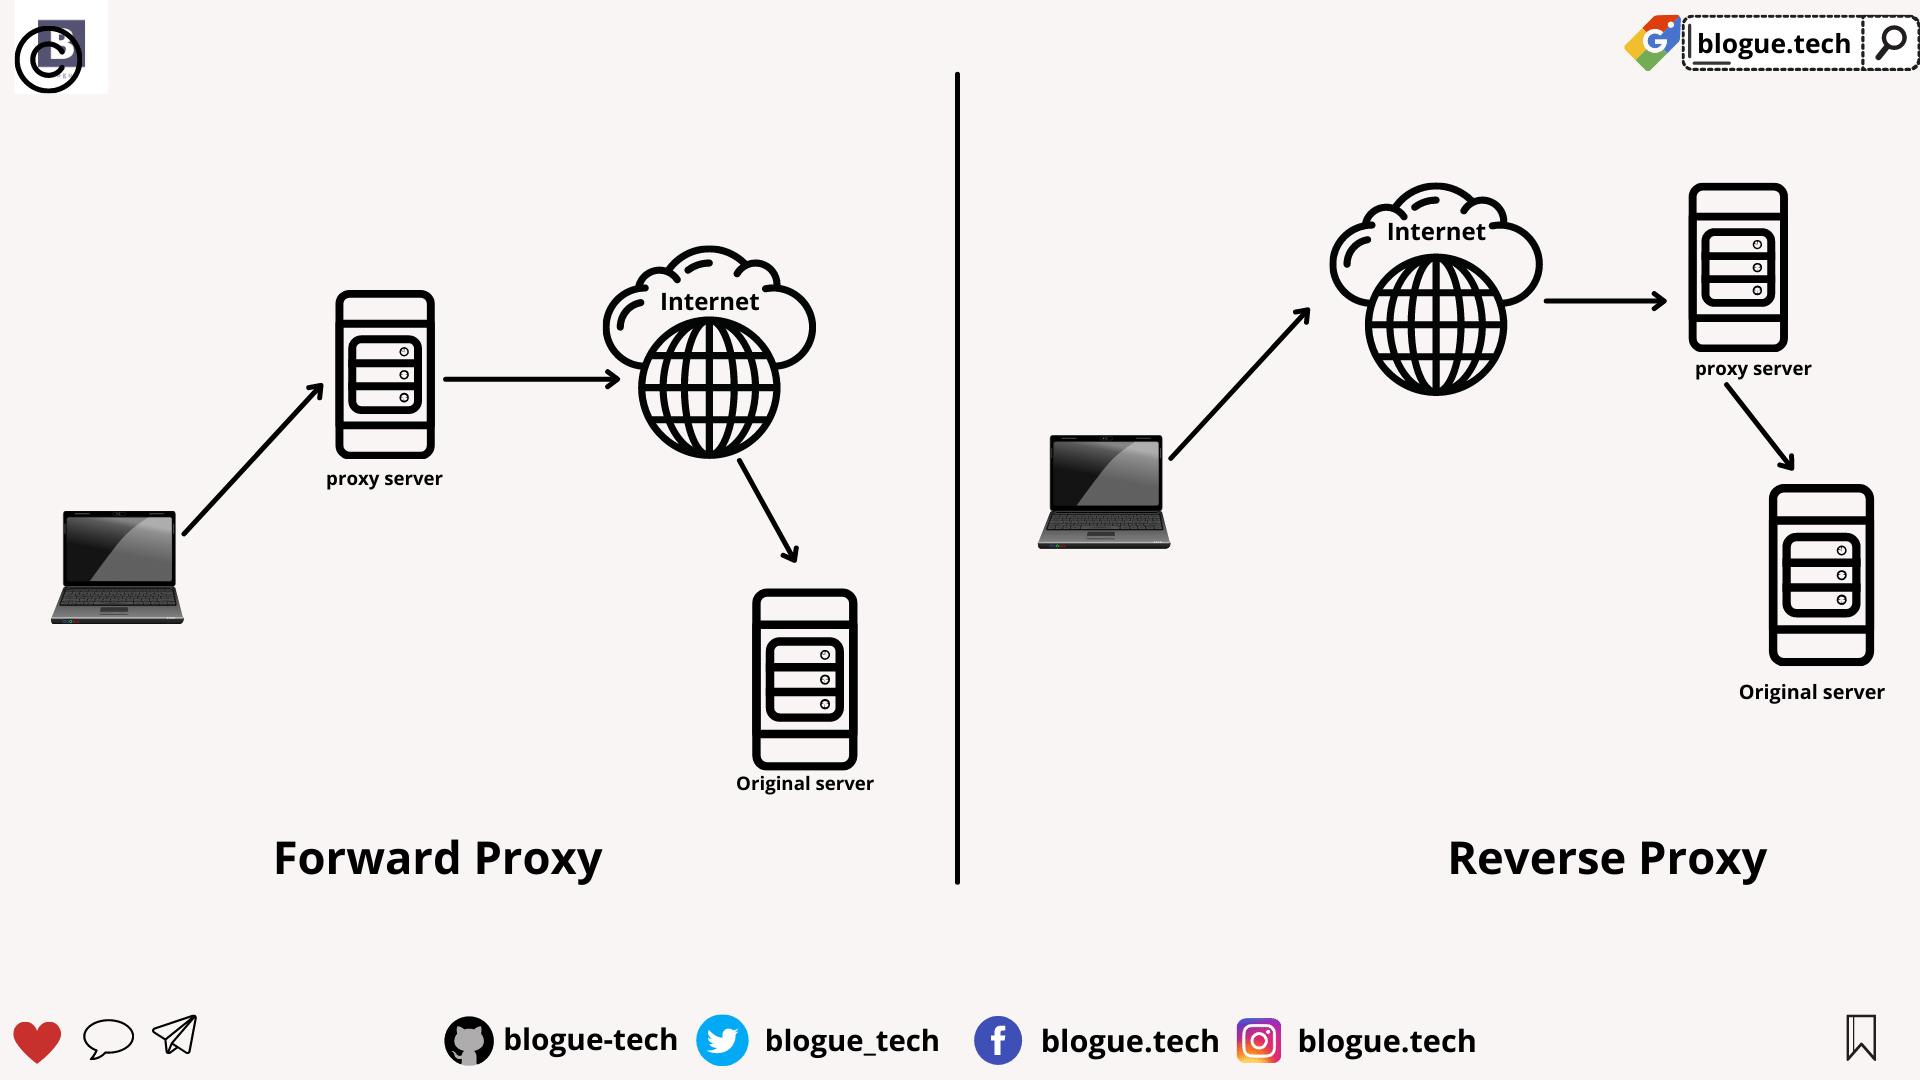 Proxy and Reverse Proxy